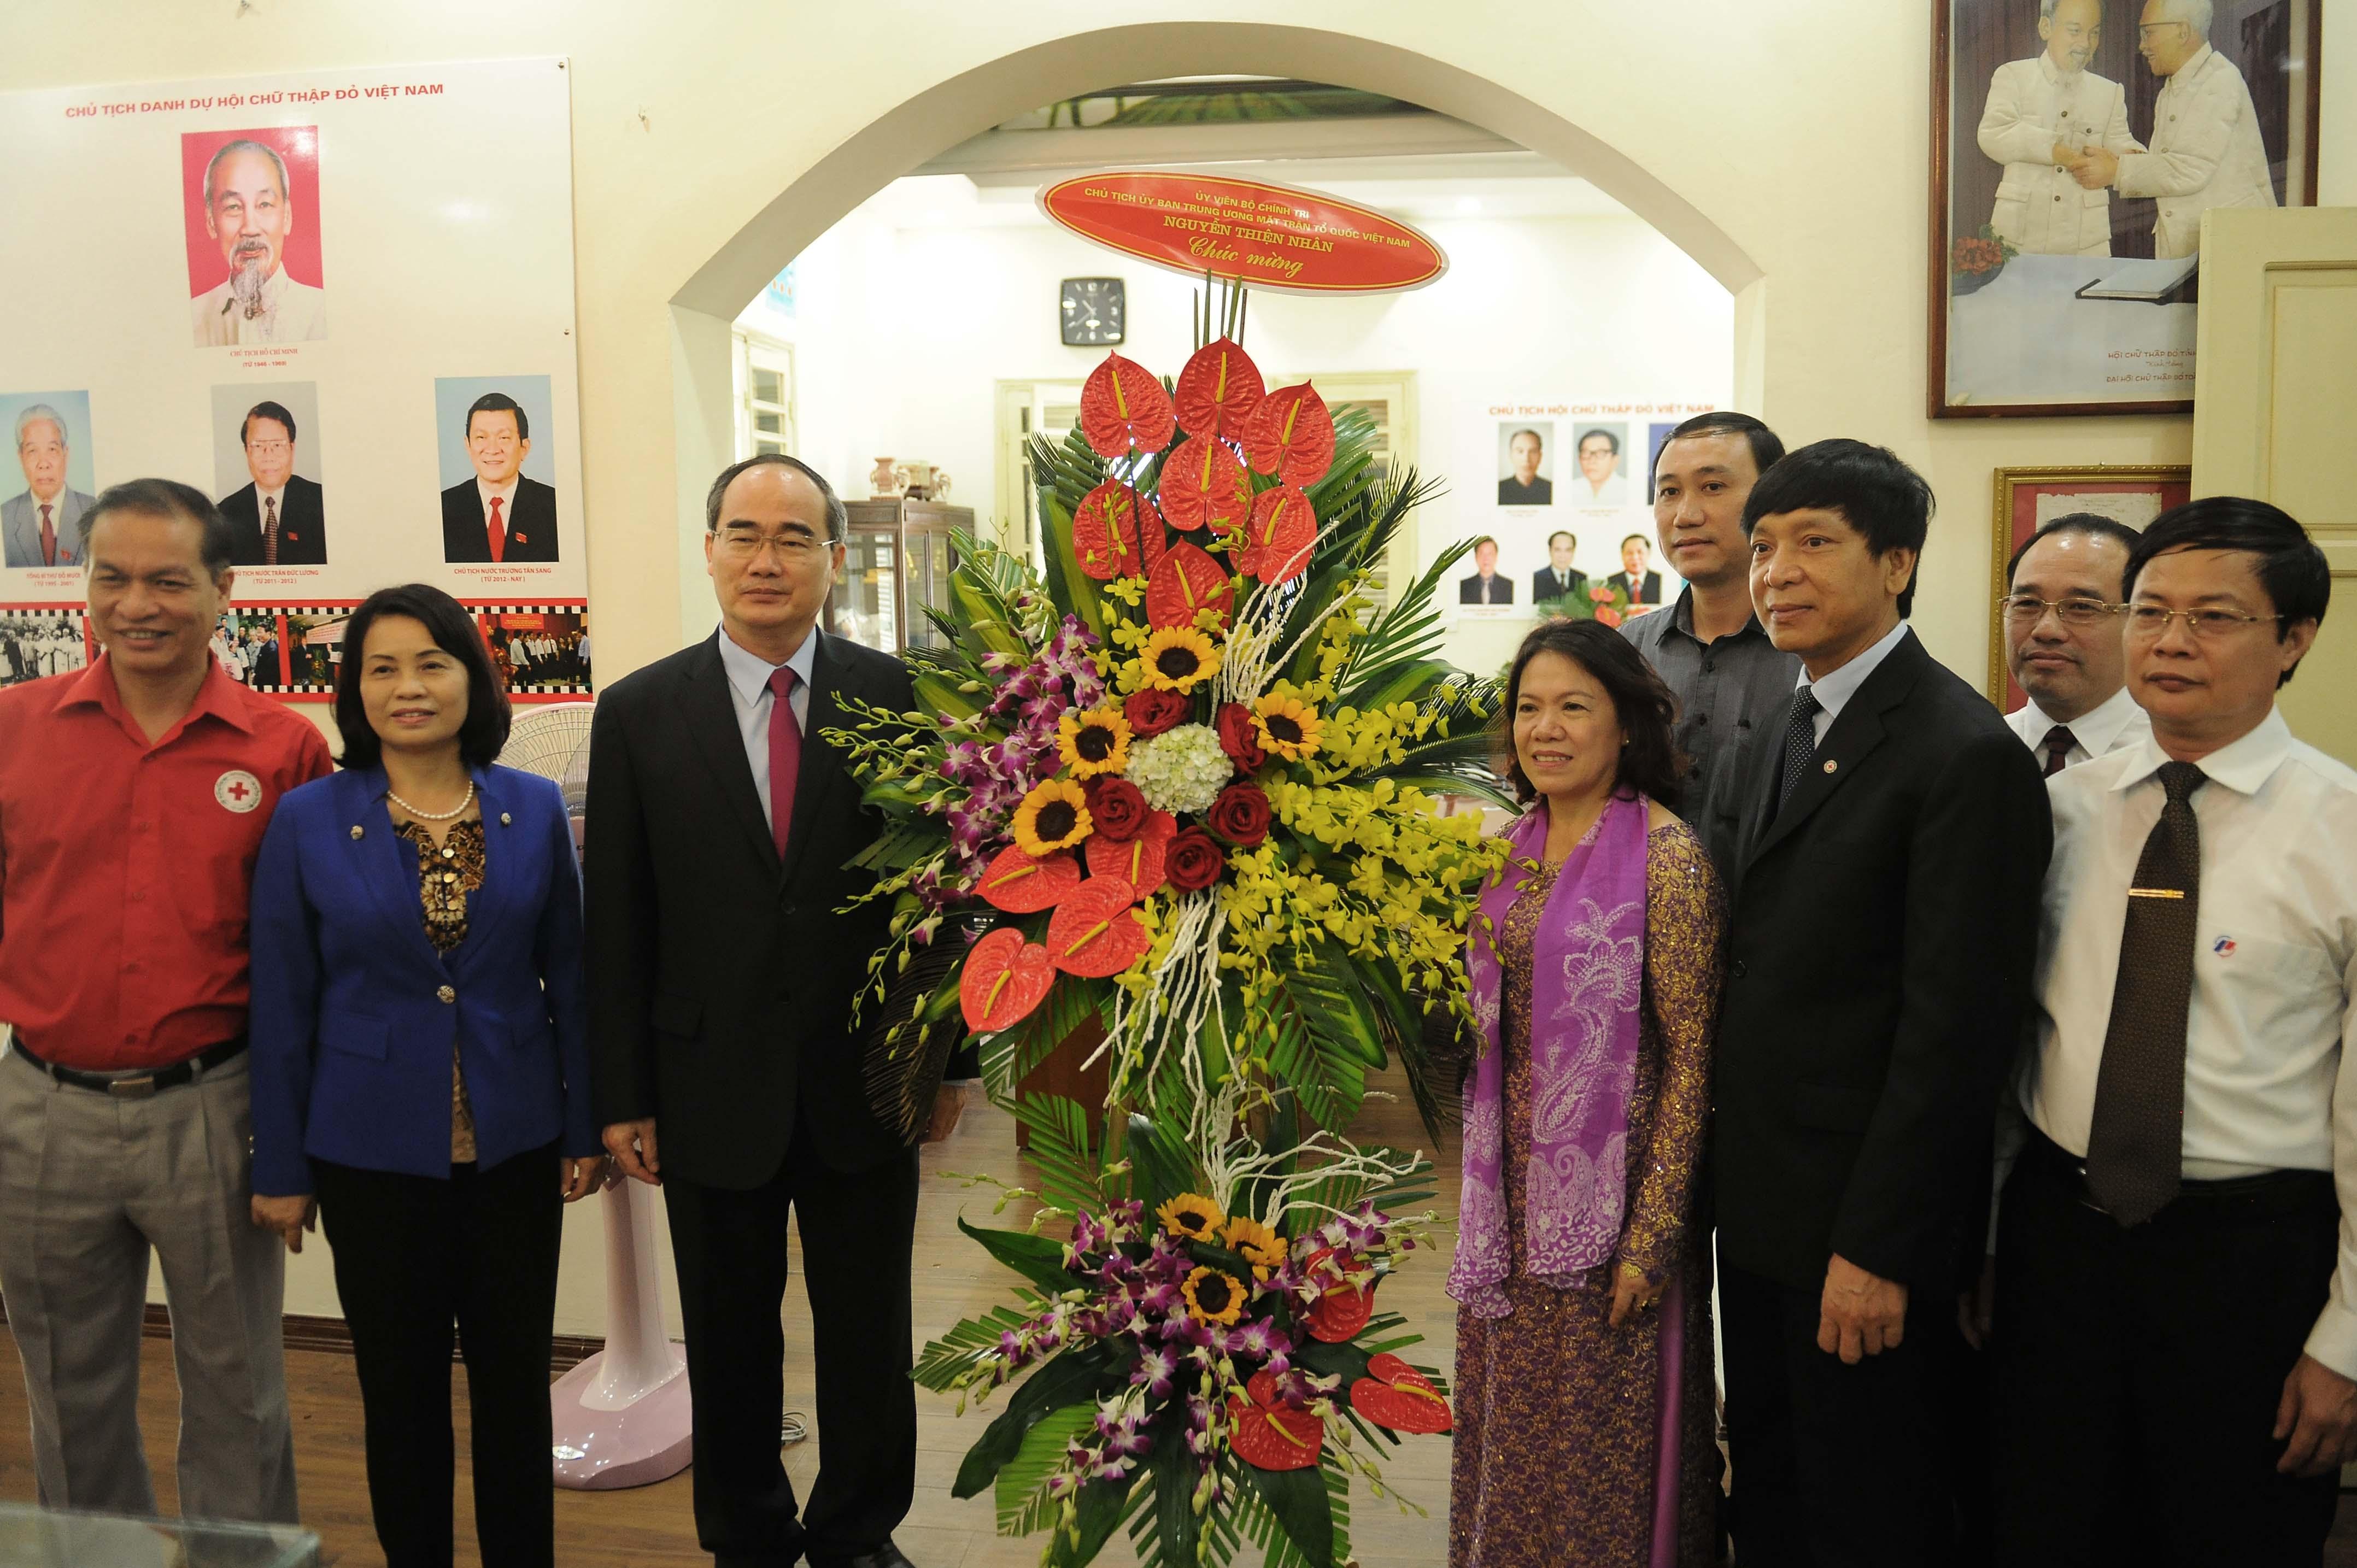 VFF President congratulates Vietnam Red Cross Society's 70th anniversary